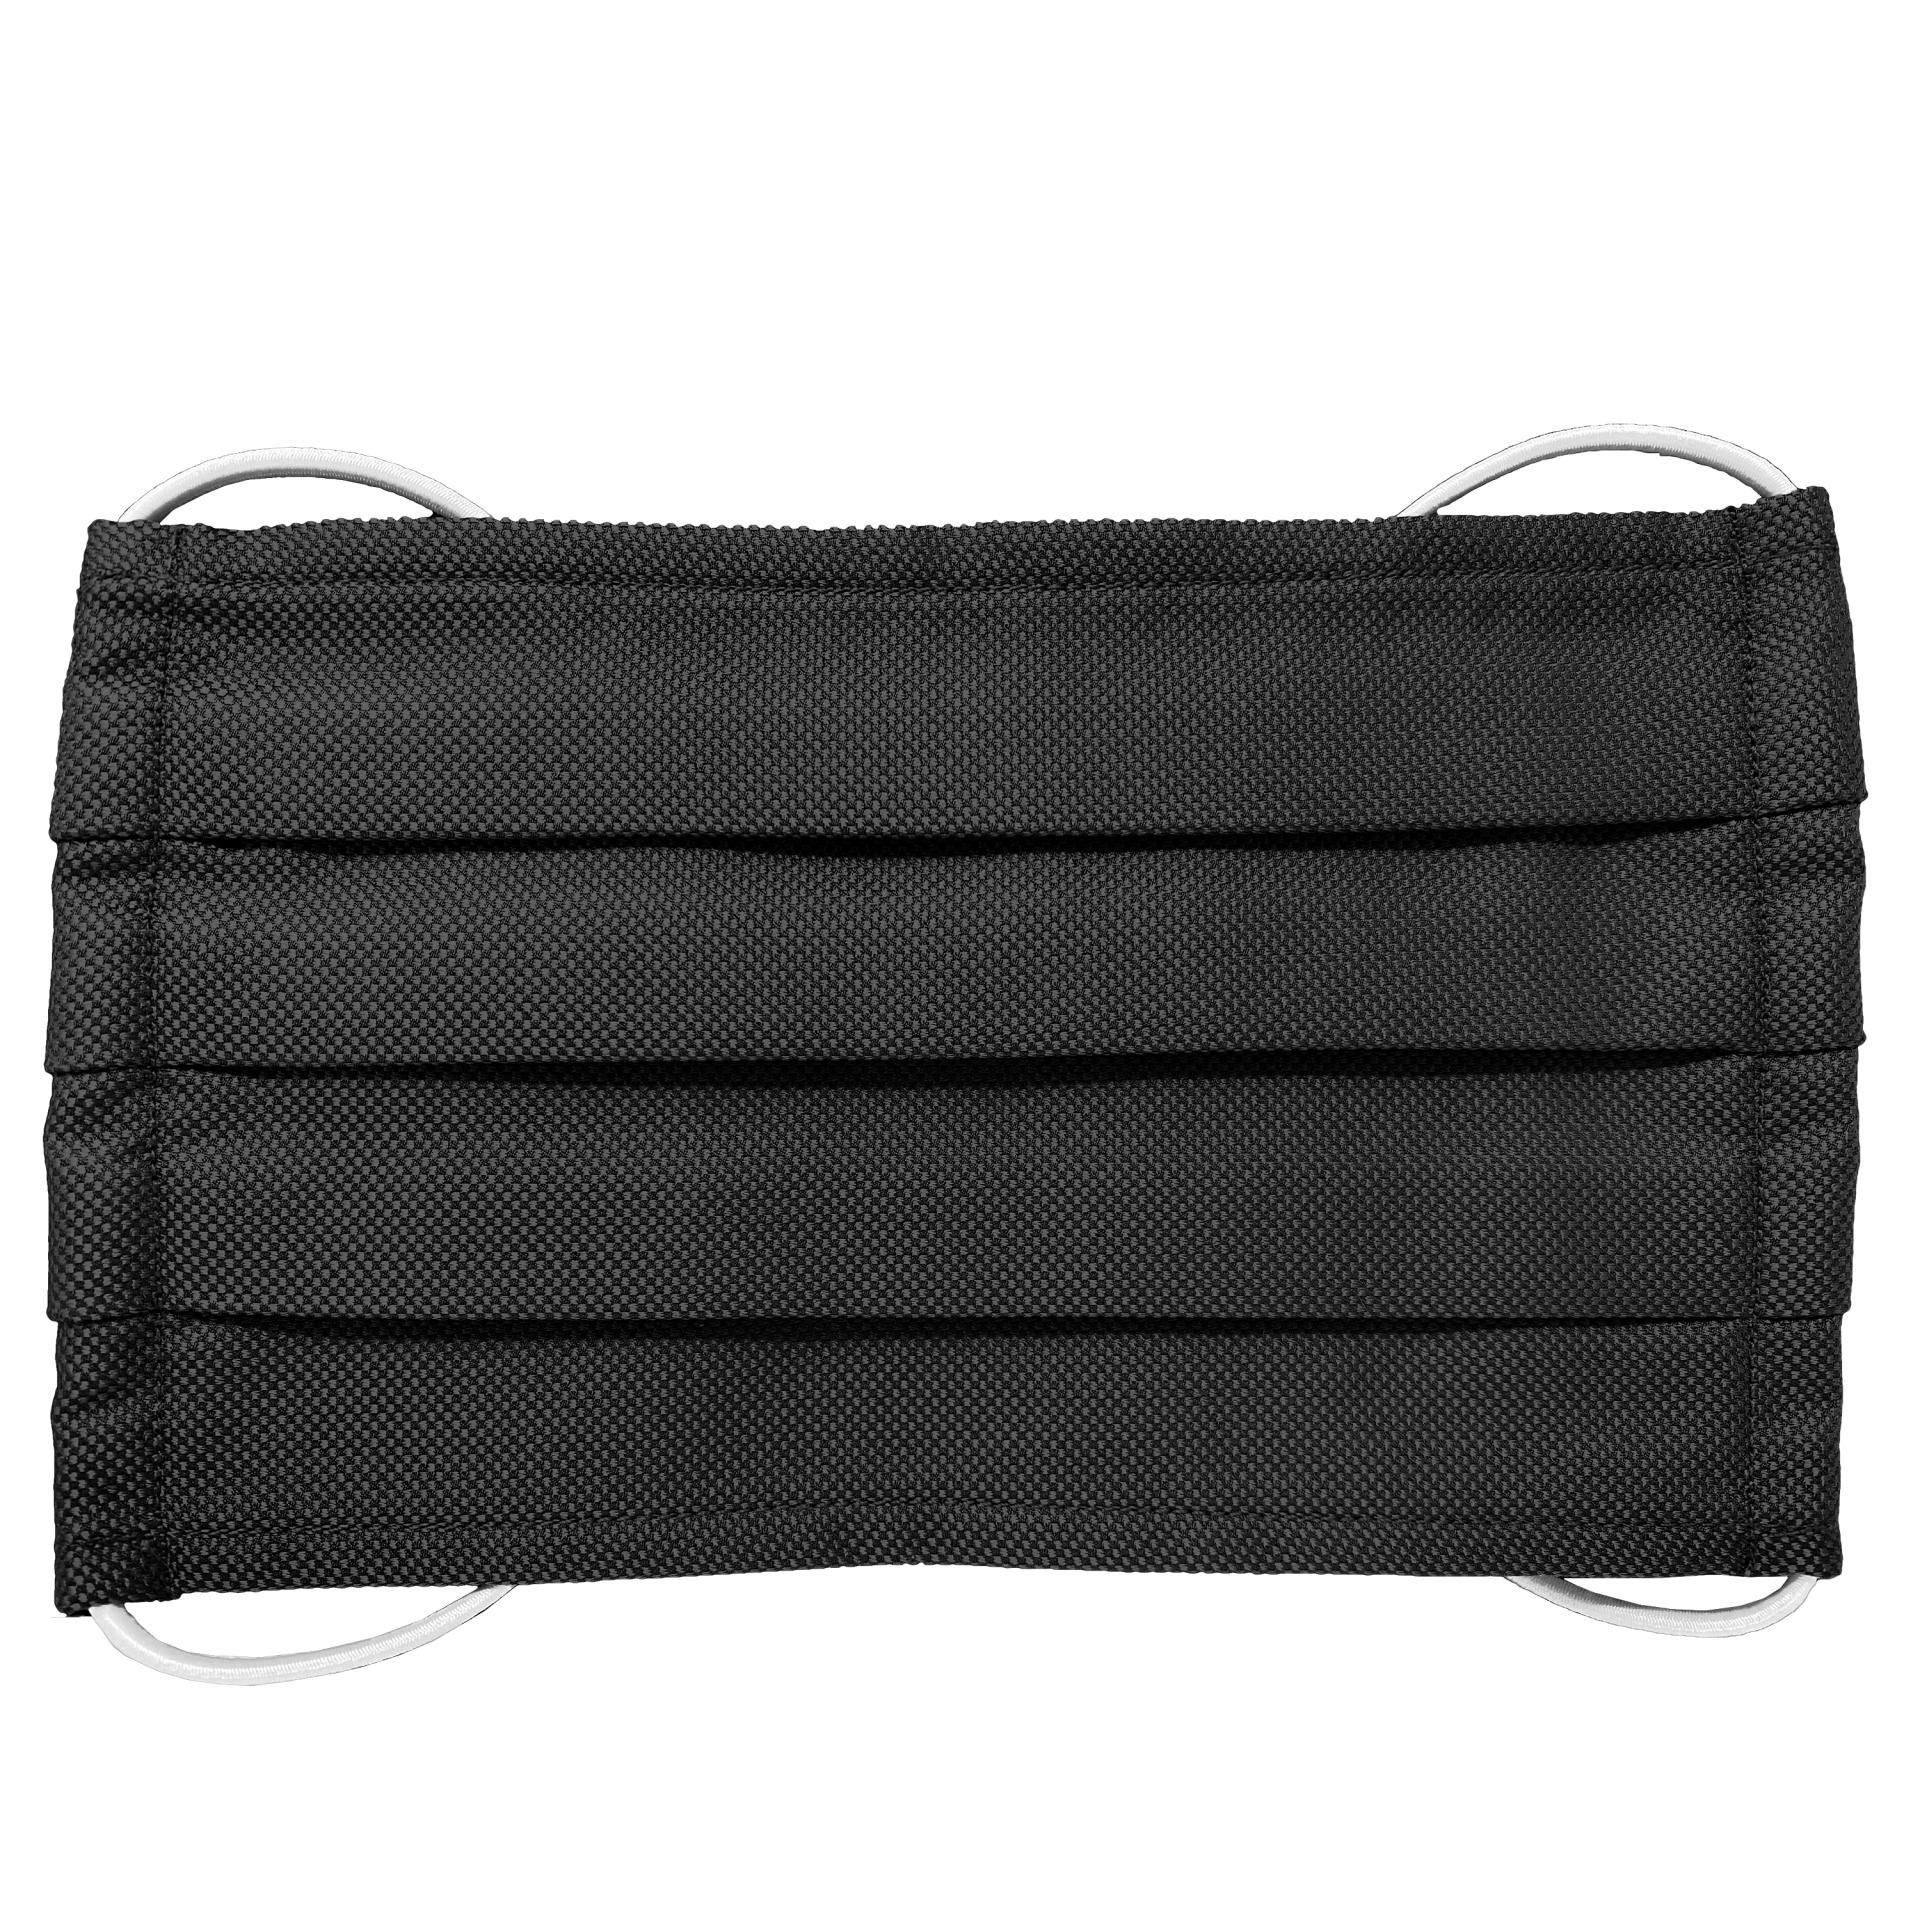 Fashion protective fabric mask, color grey